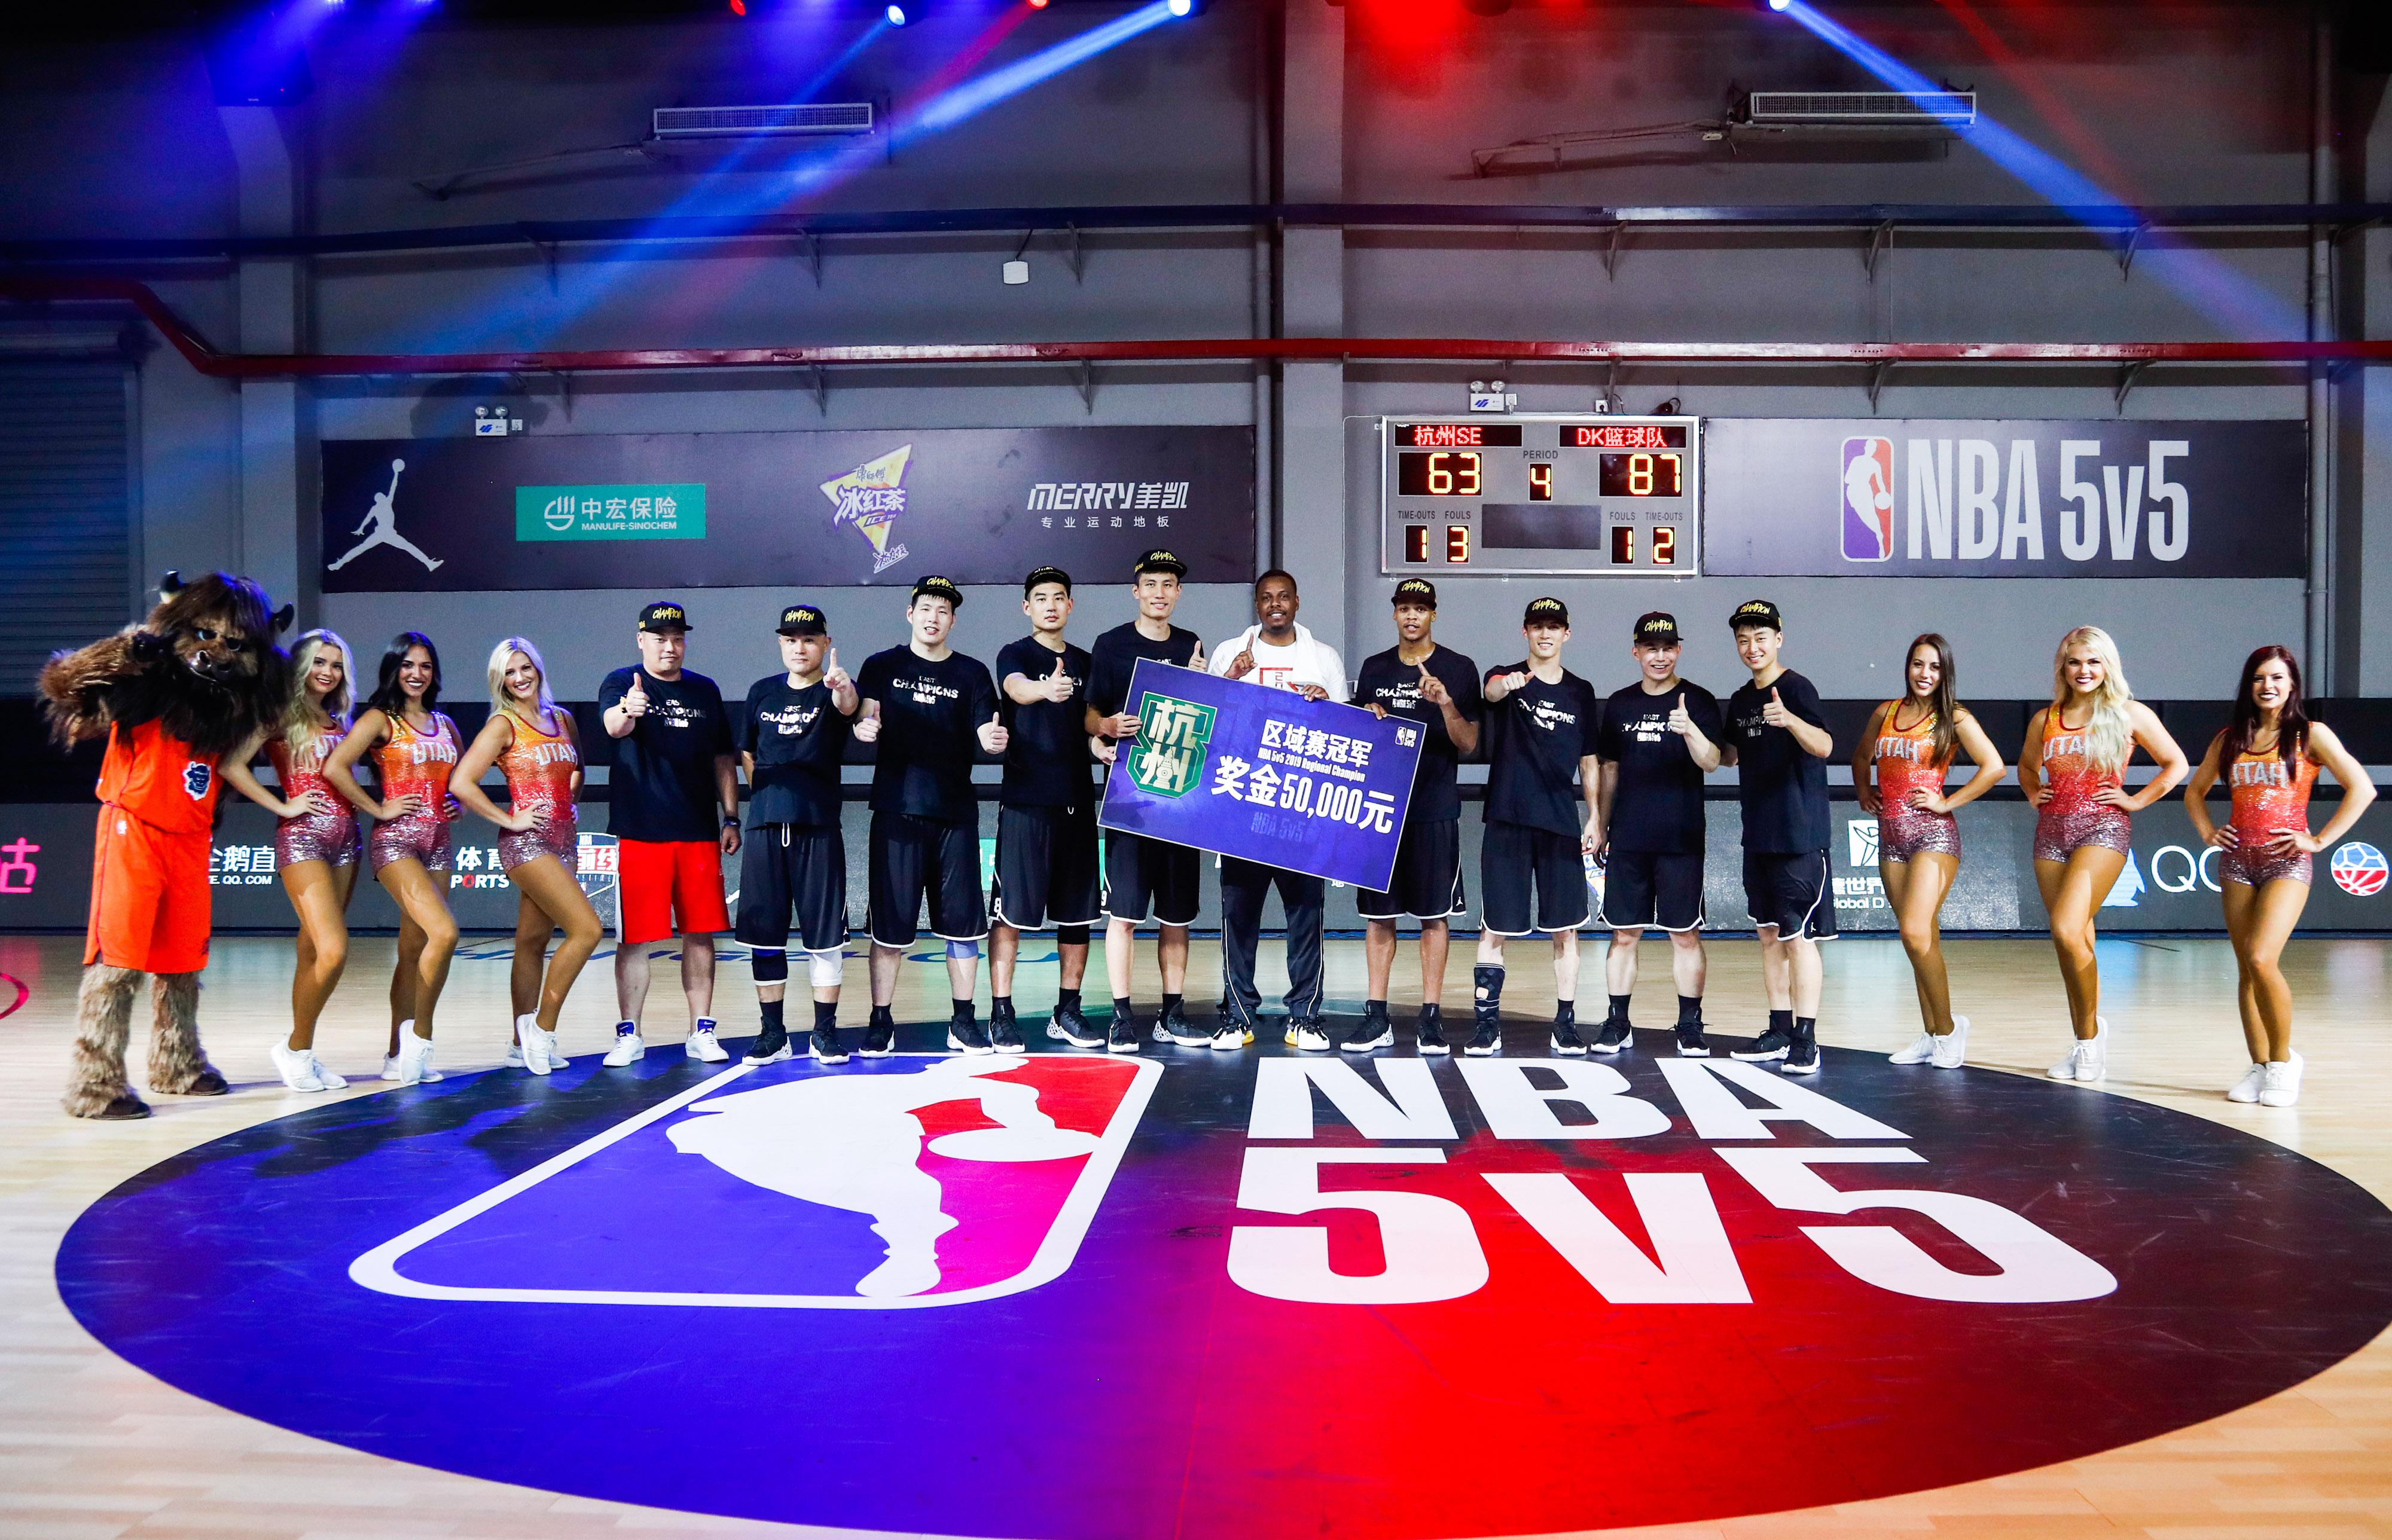 NBA 5v5精英篮球赛杭州赛区顺利落幕!DK夺得冠军